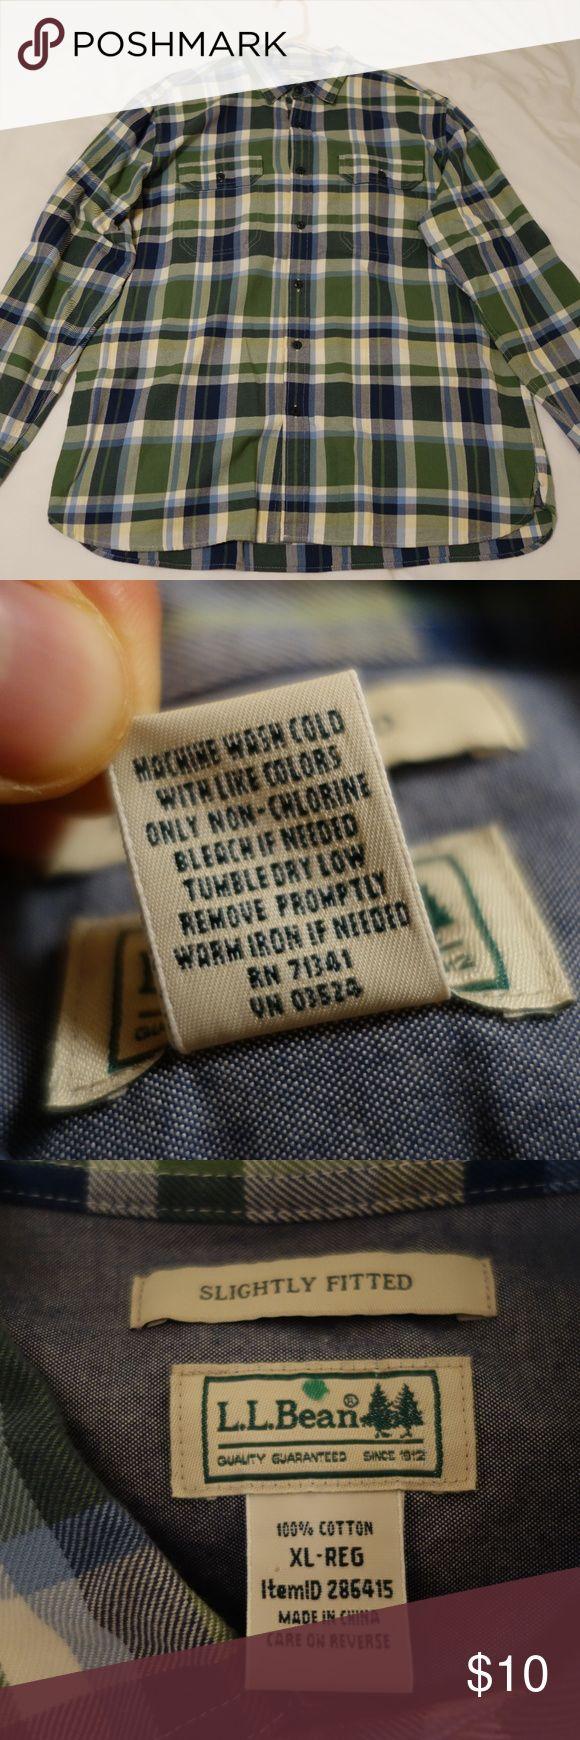 Men's flannel shirt L.L. Bean Green/Blue Flannel Shirt Size Extra Large (XL), Regular Length 100% Cotton L.L. Bean Shirts Casual Button Down Shirts